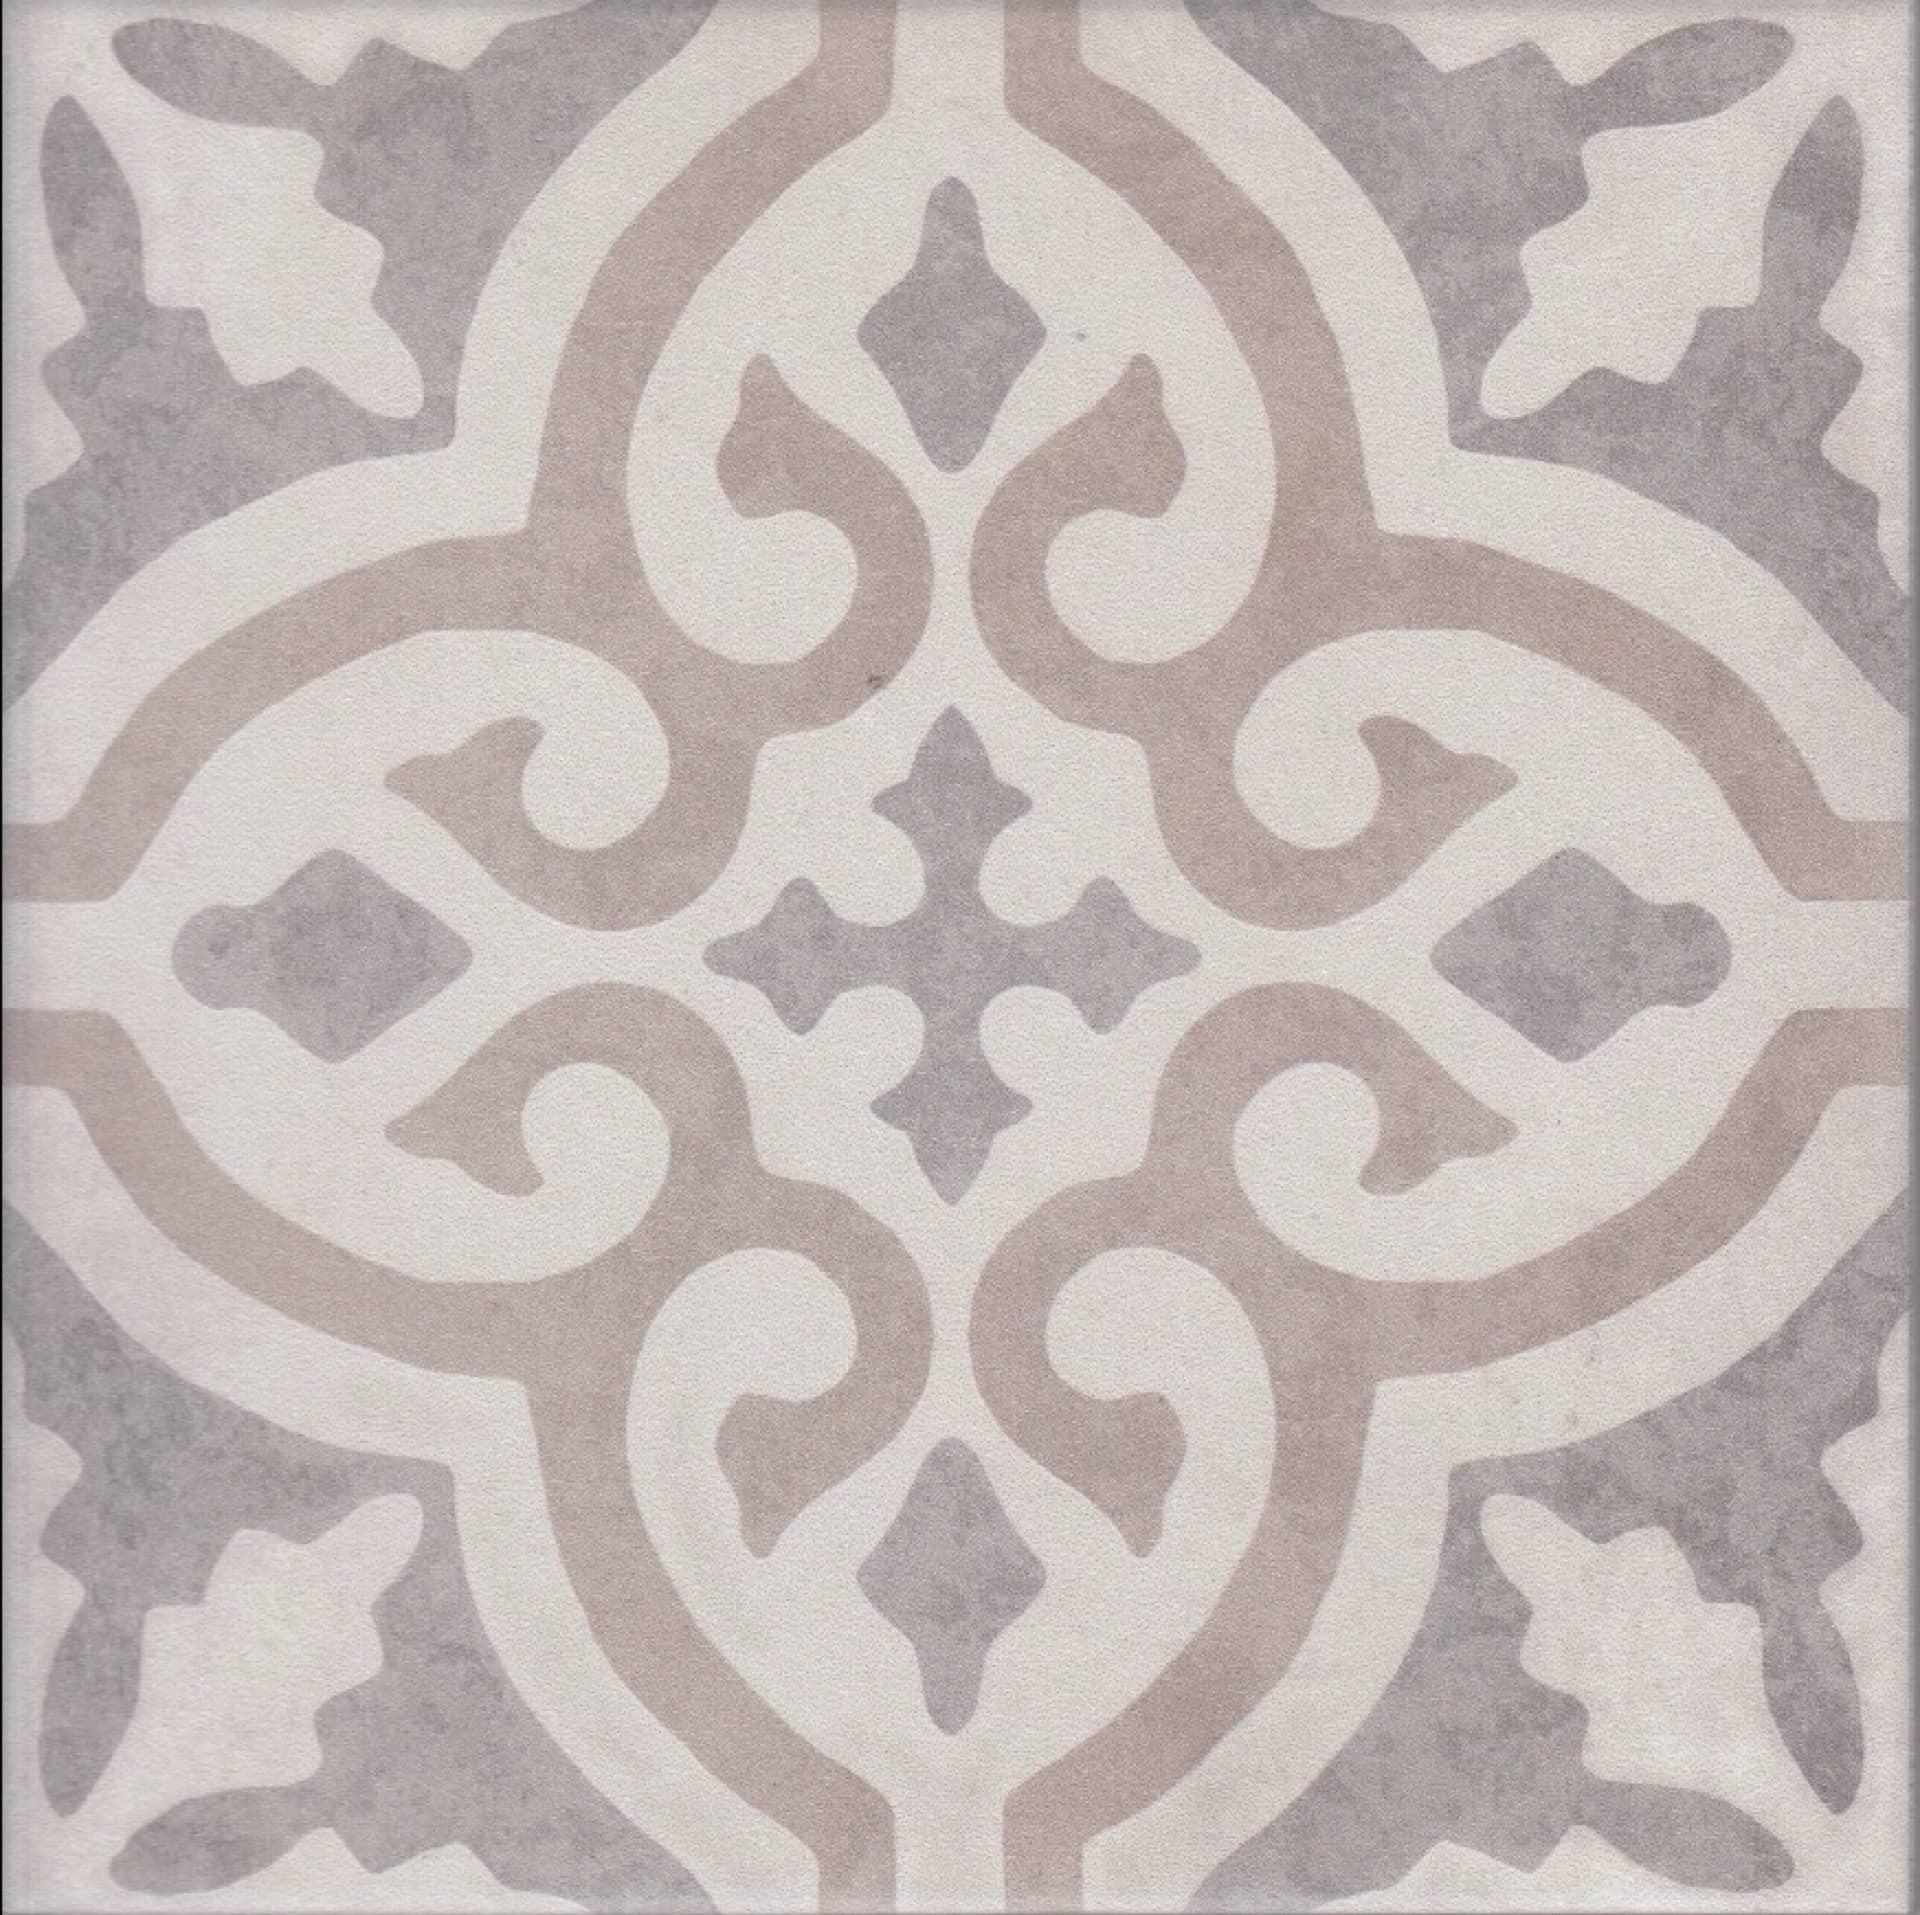 Carnaby Street Pattern_1585